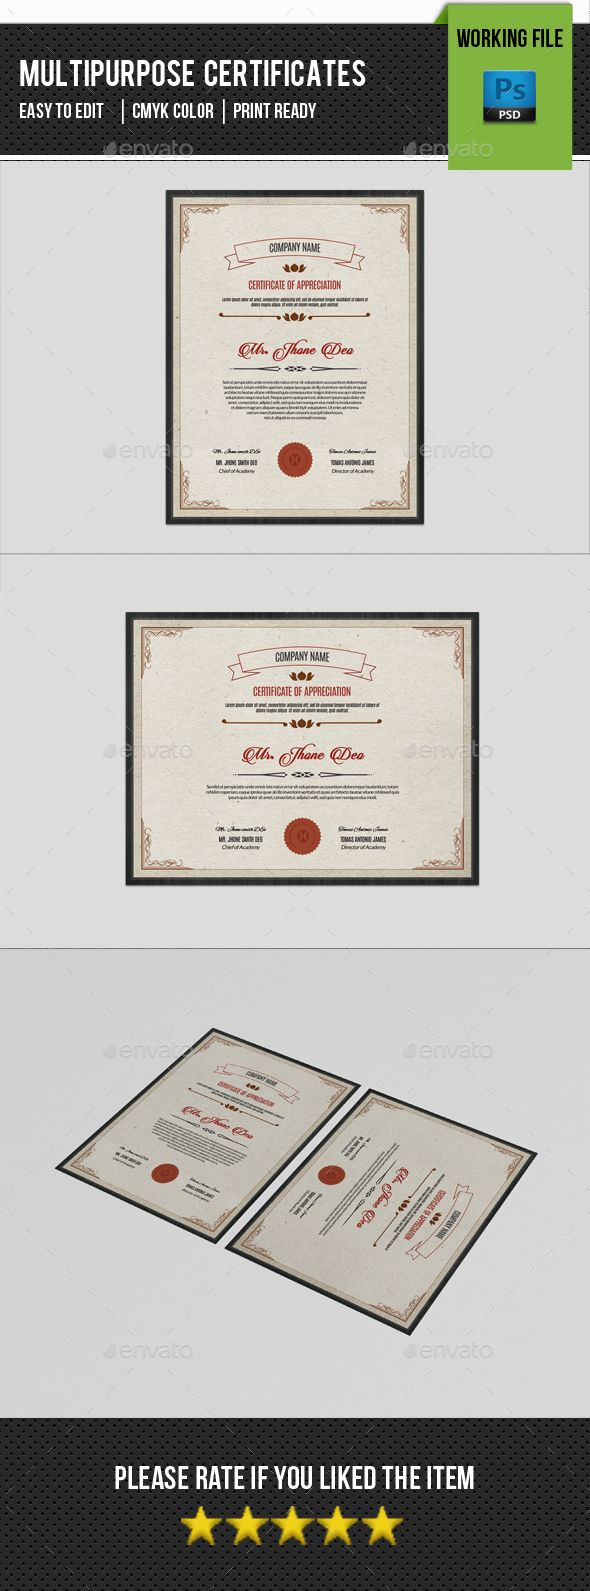 Multipurpose Certificate Template-V01